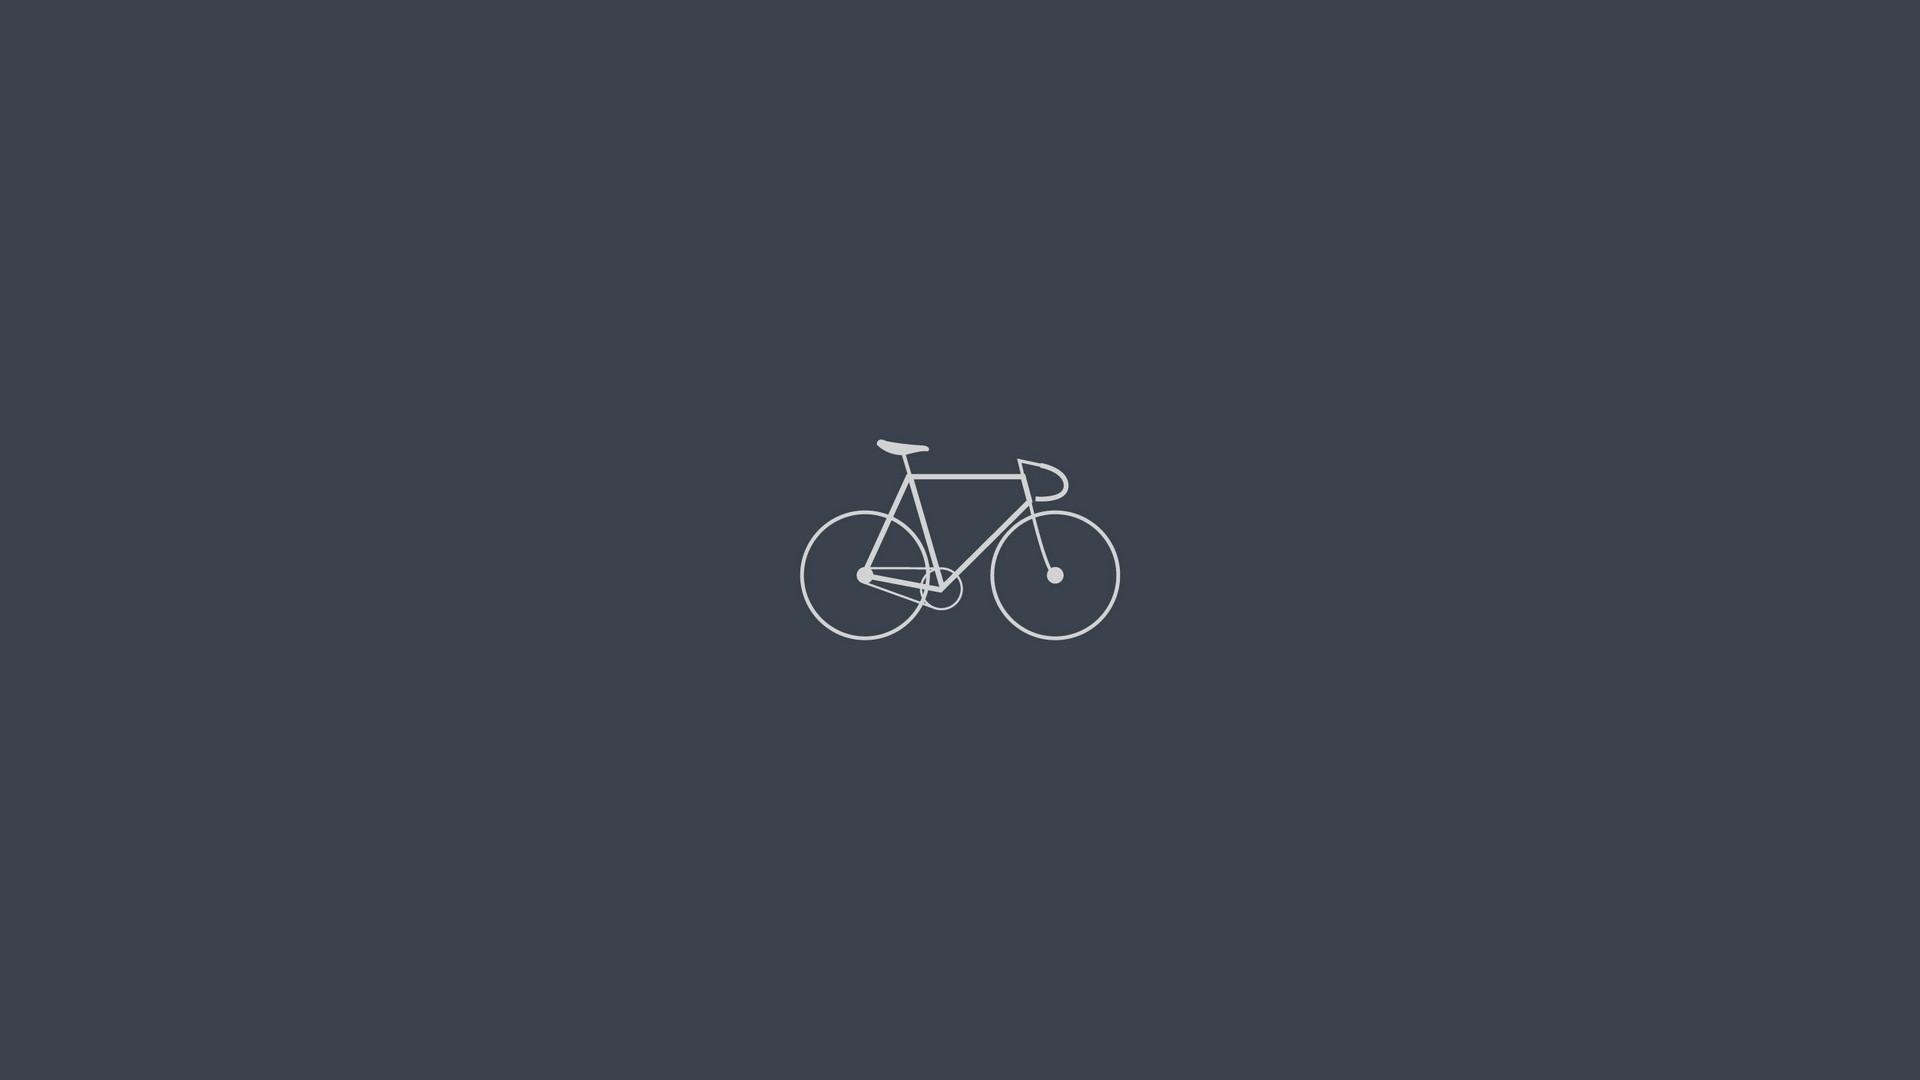 Wallpaper bicycle, minimalism, gray